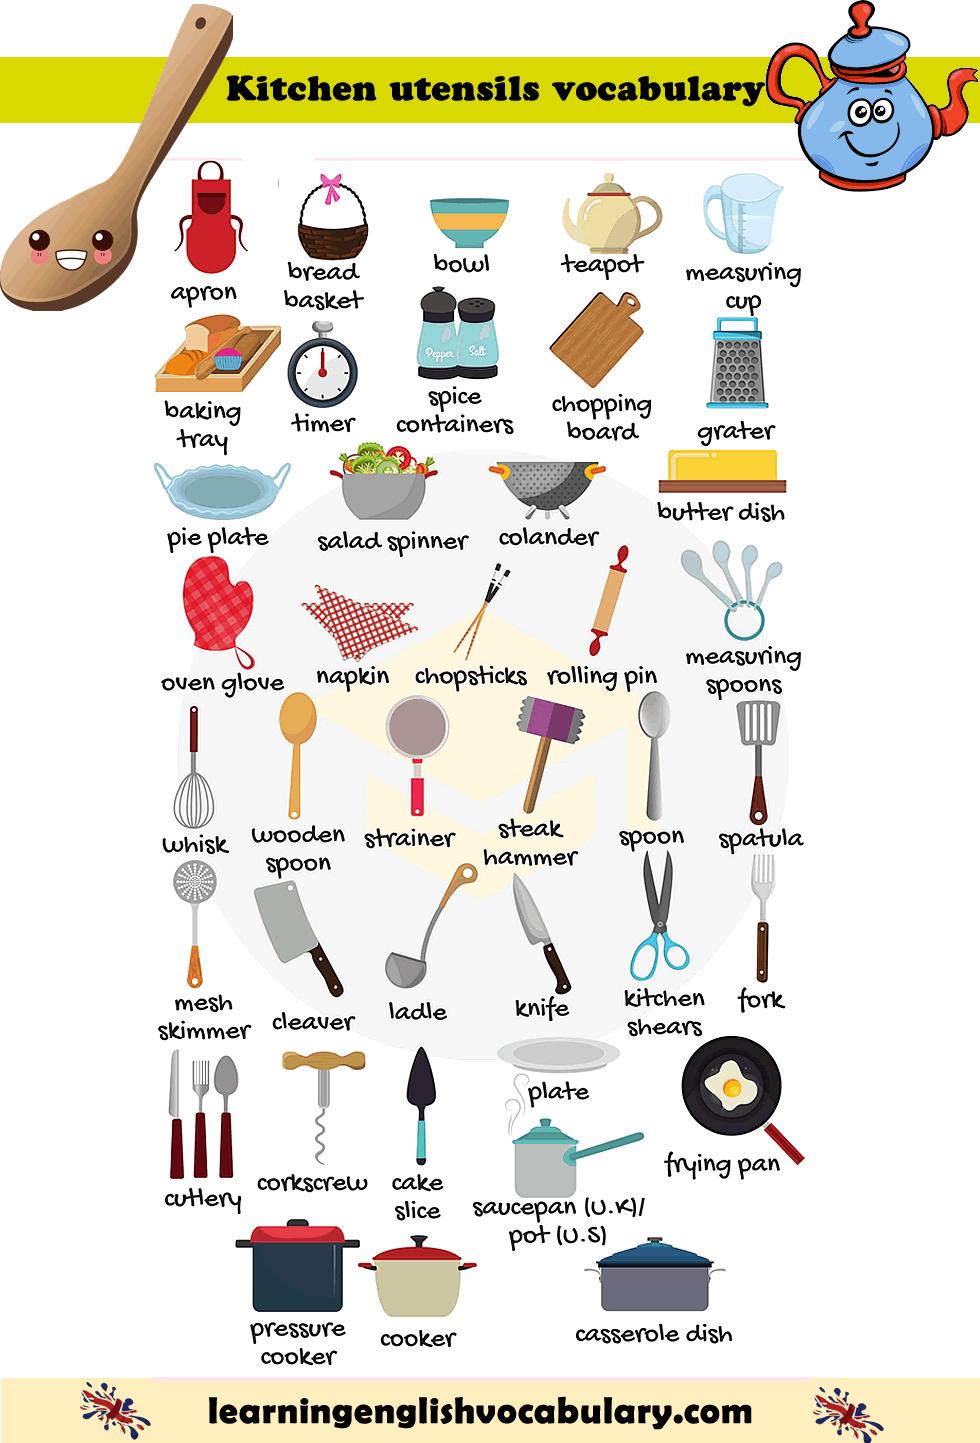 Kitchen Utensils Cookware Vocabulary List Pdf Vocabulary List